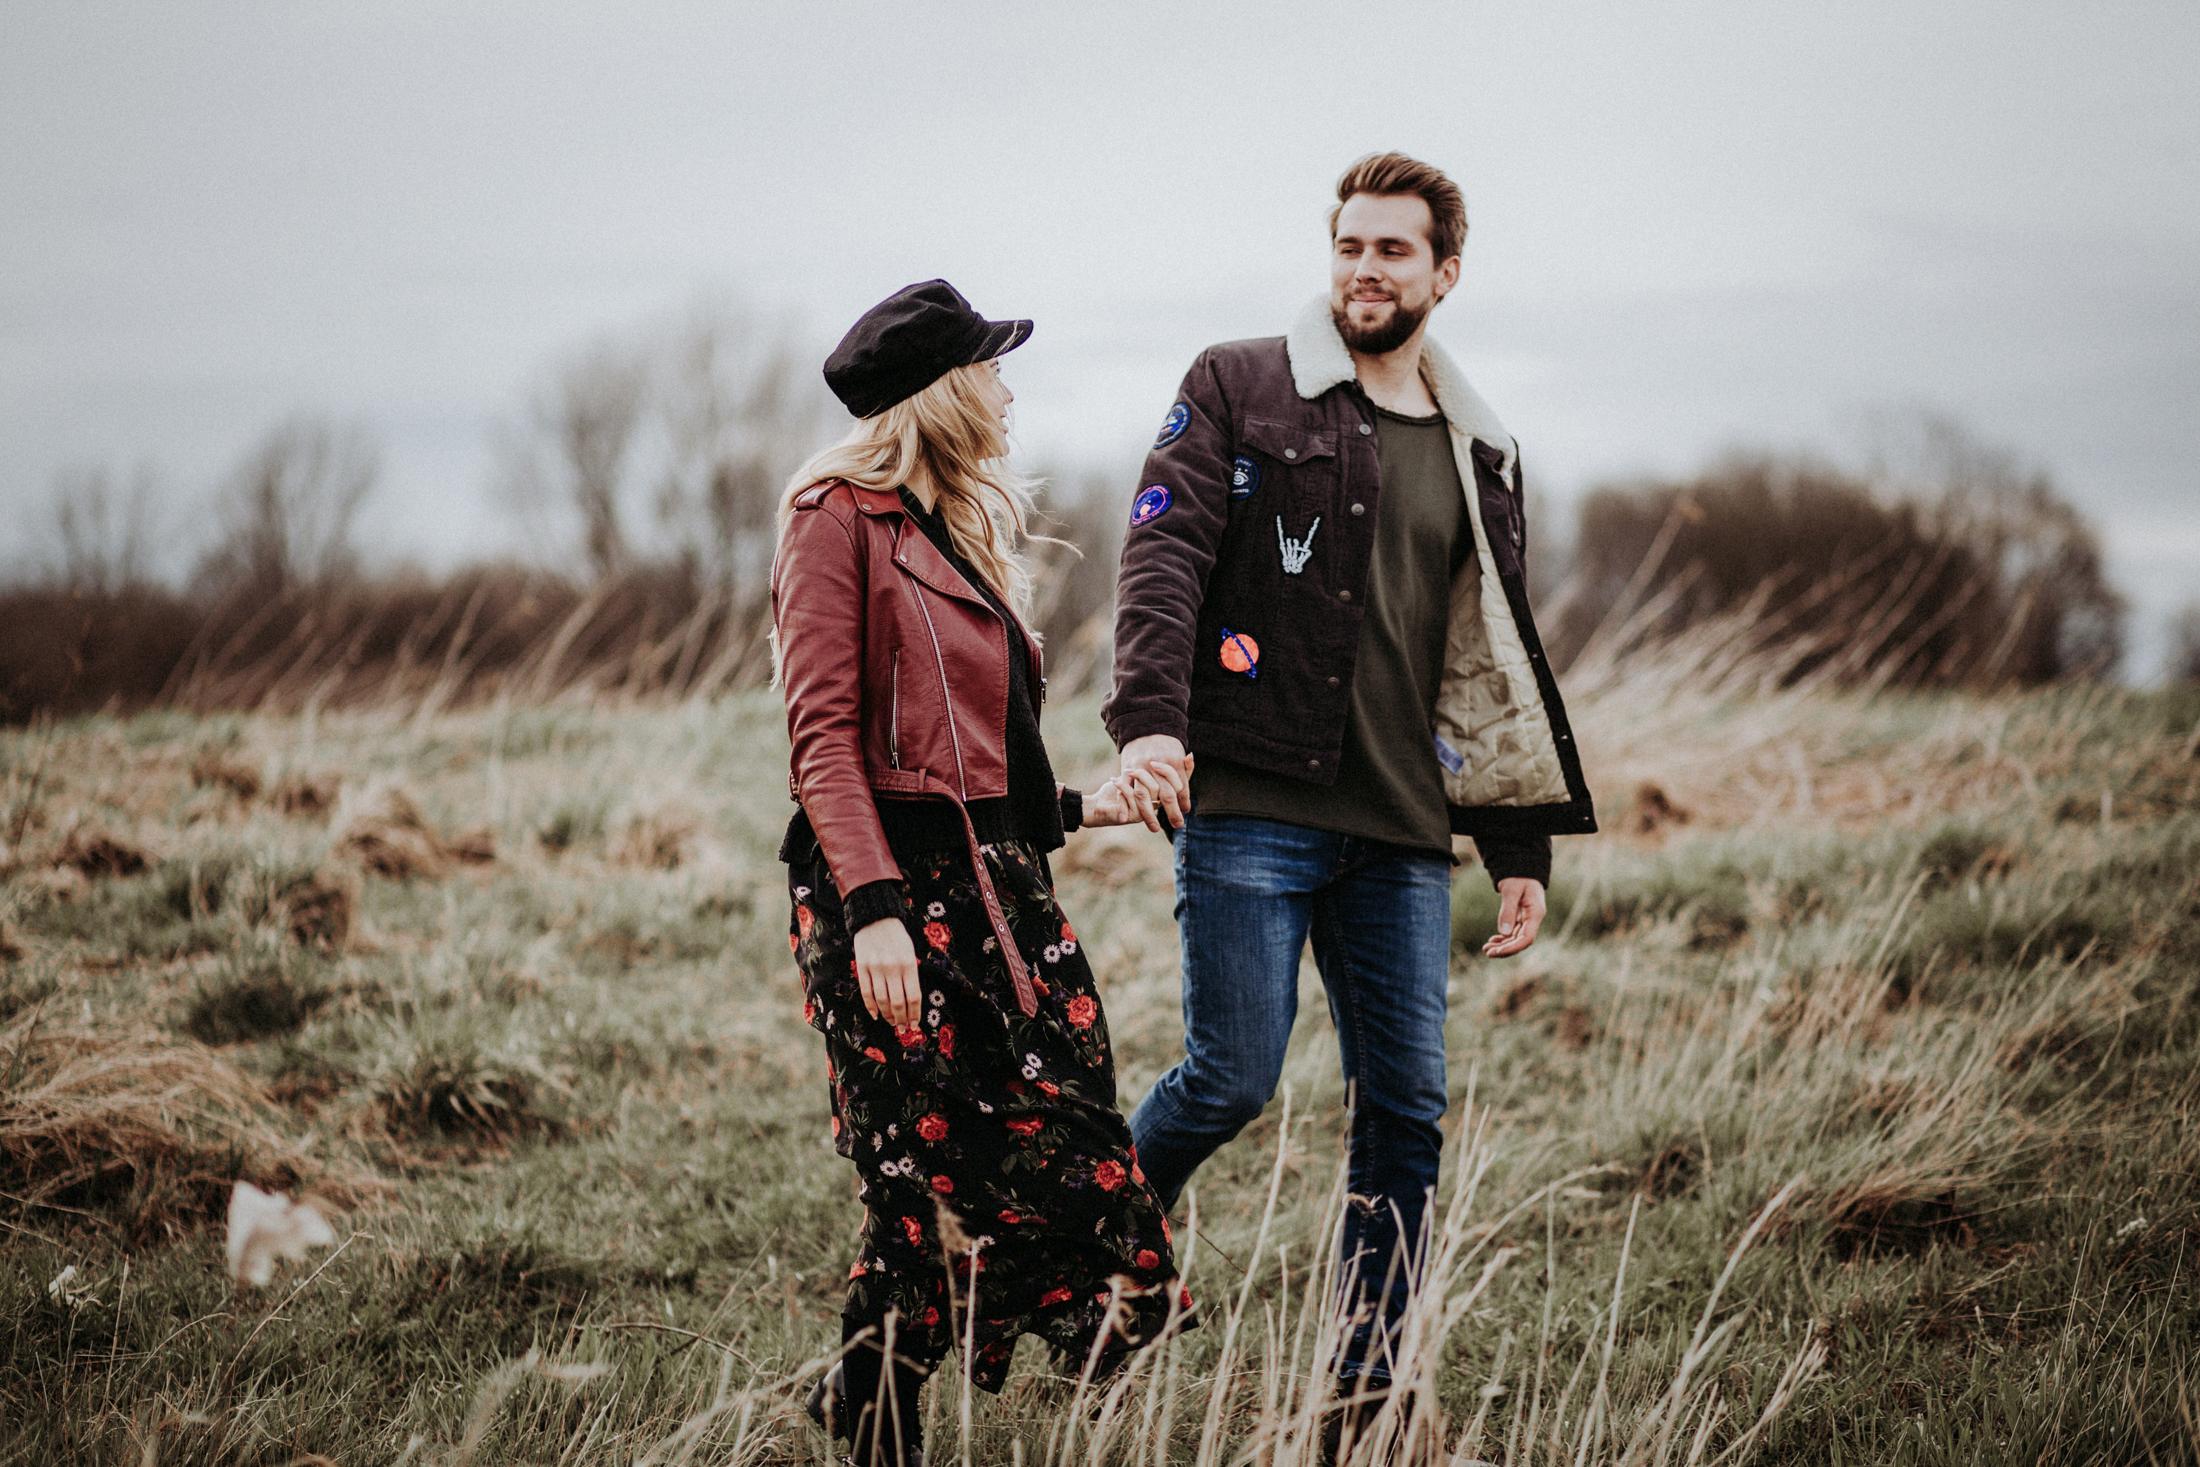 Wedding_Photographer_Mallorca_DanielaMarquardt_Photography_CanaryIslands_Lanzarote_Iceland_Tuscany_Santorini_Portugal_NewYork_Spain_Elopement_Hochzeitsfotograf_CK121